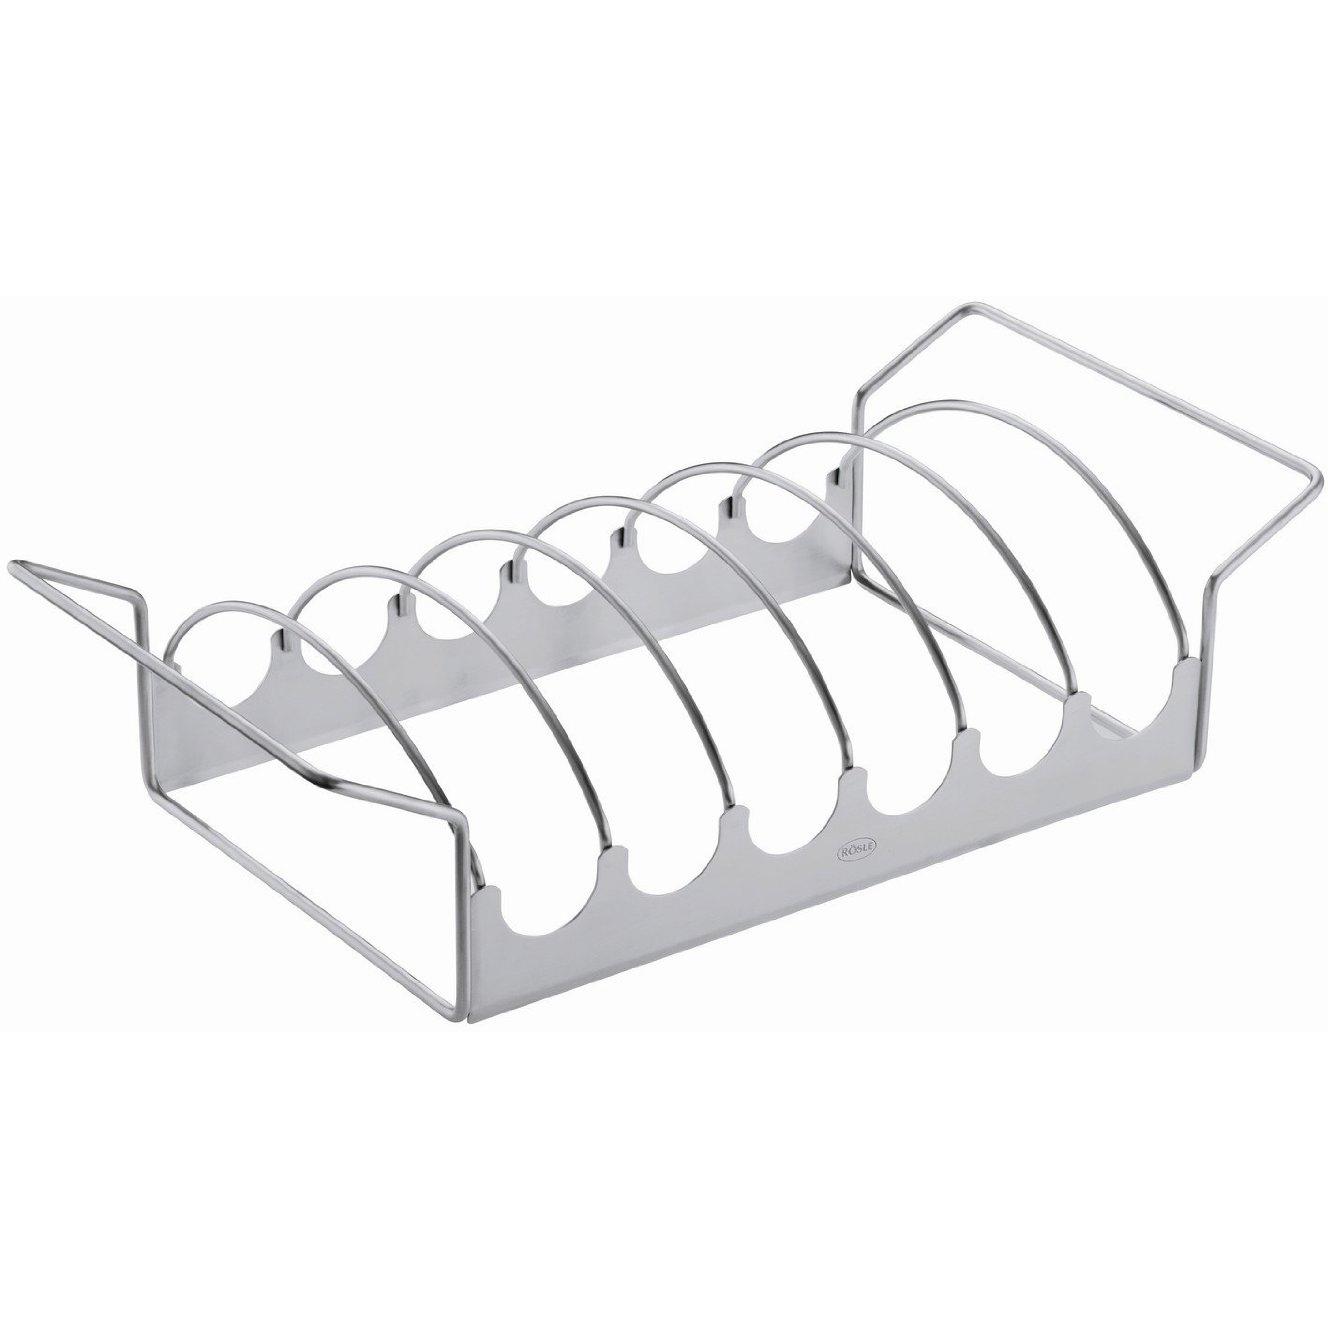 Rosle Stainless Steel Reversible Rib and Roast Rack, 17 Inch